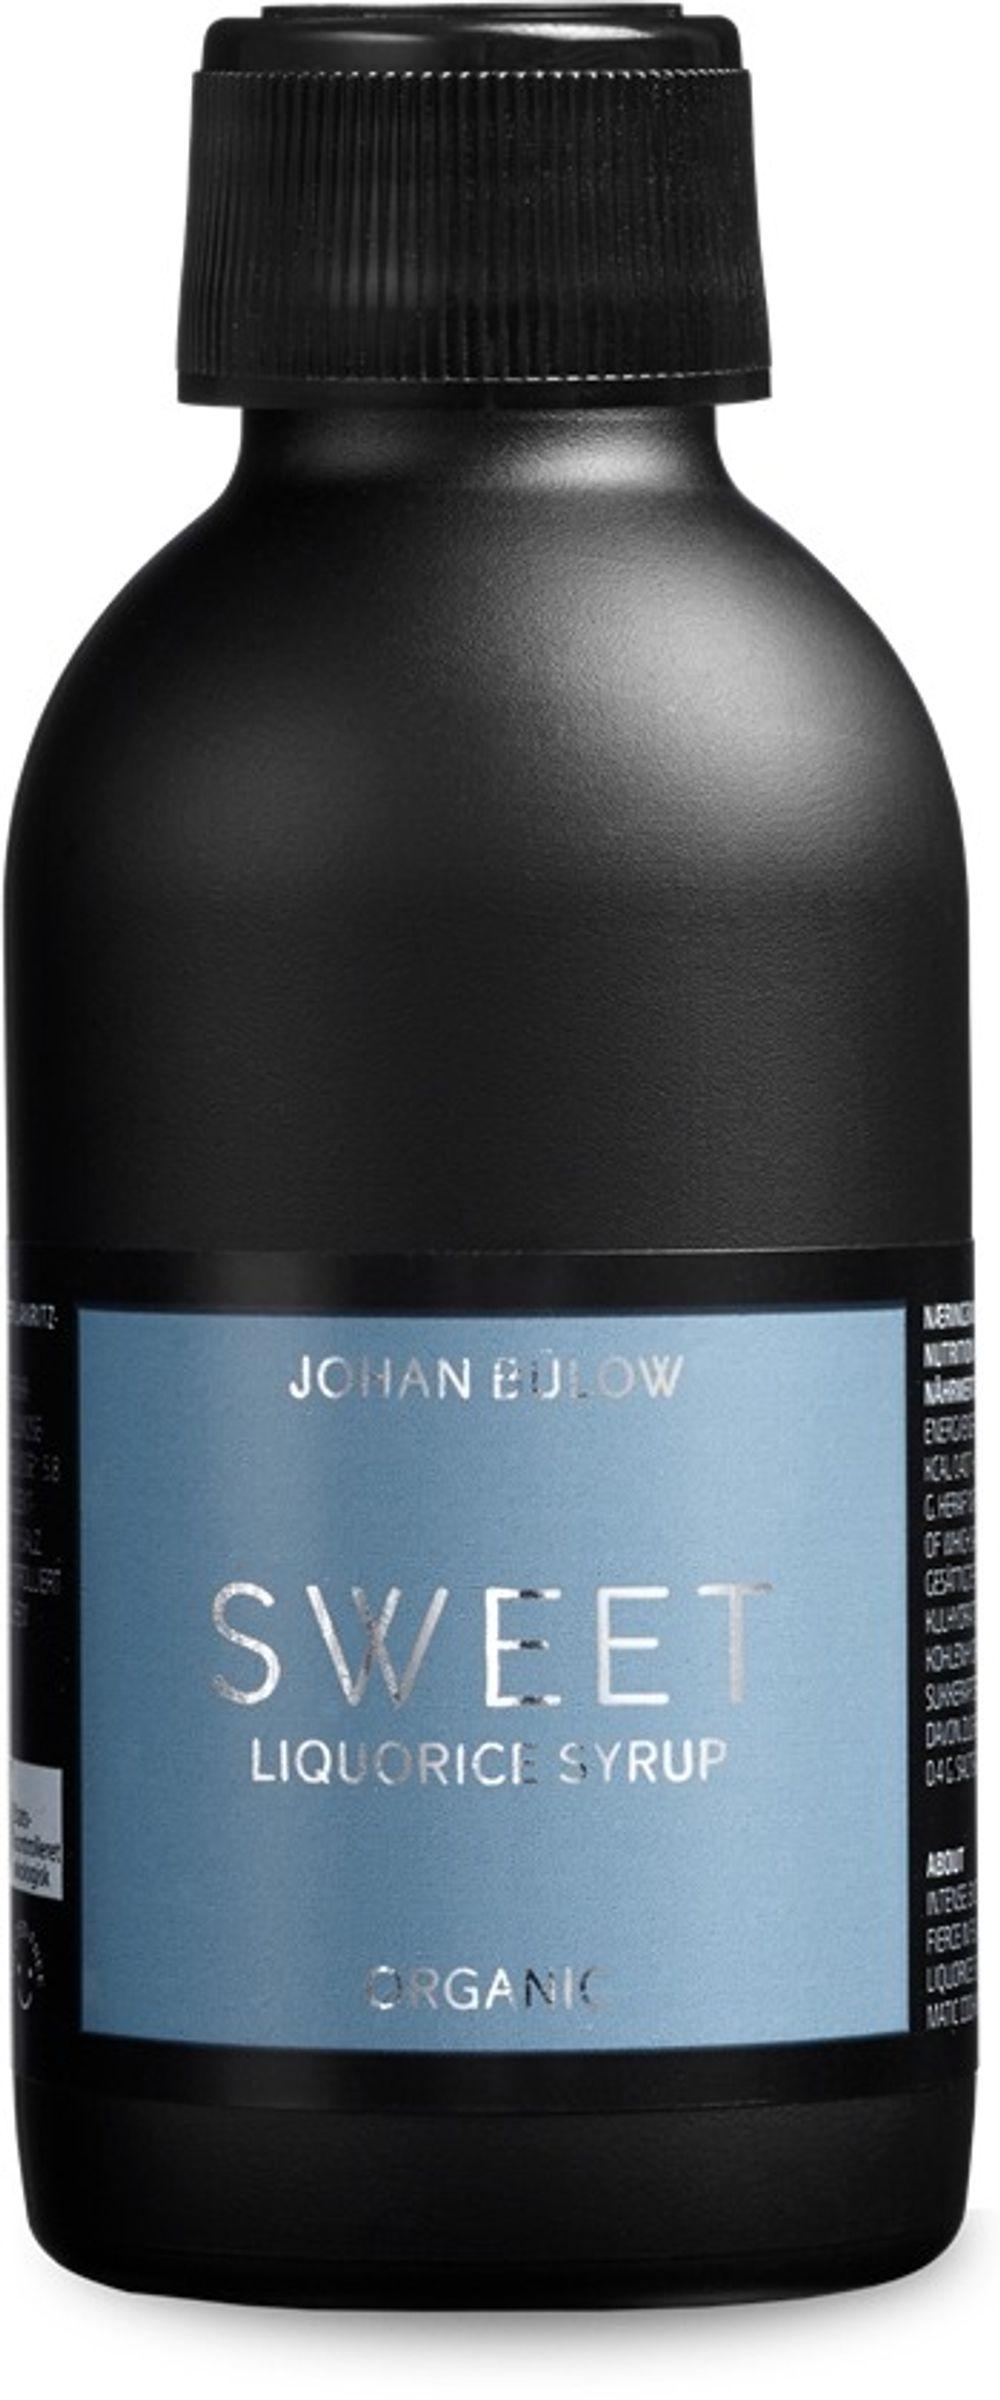 Organic Sweet Liquorice Syrup